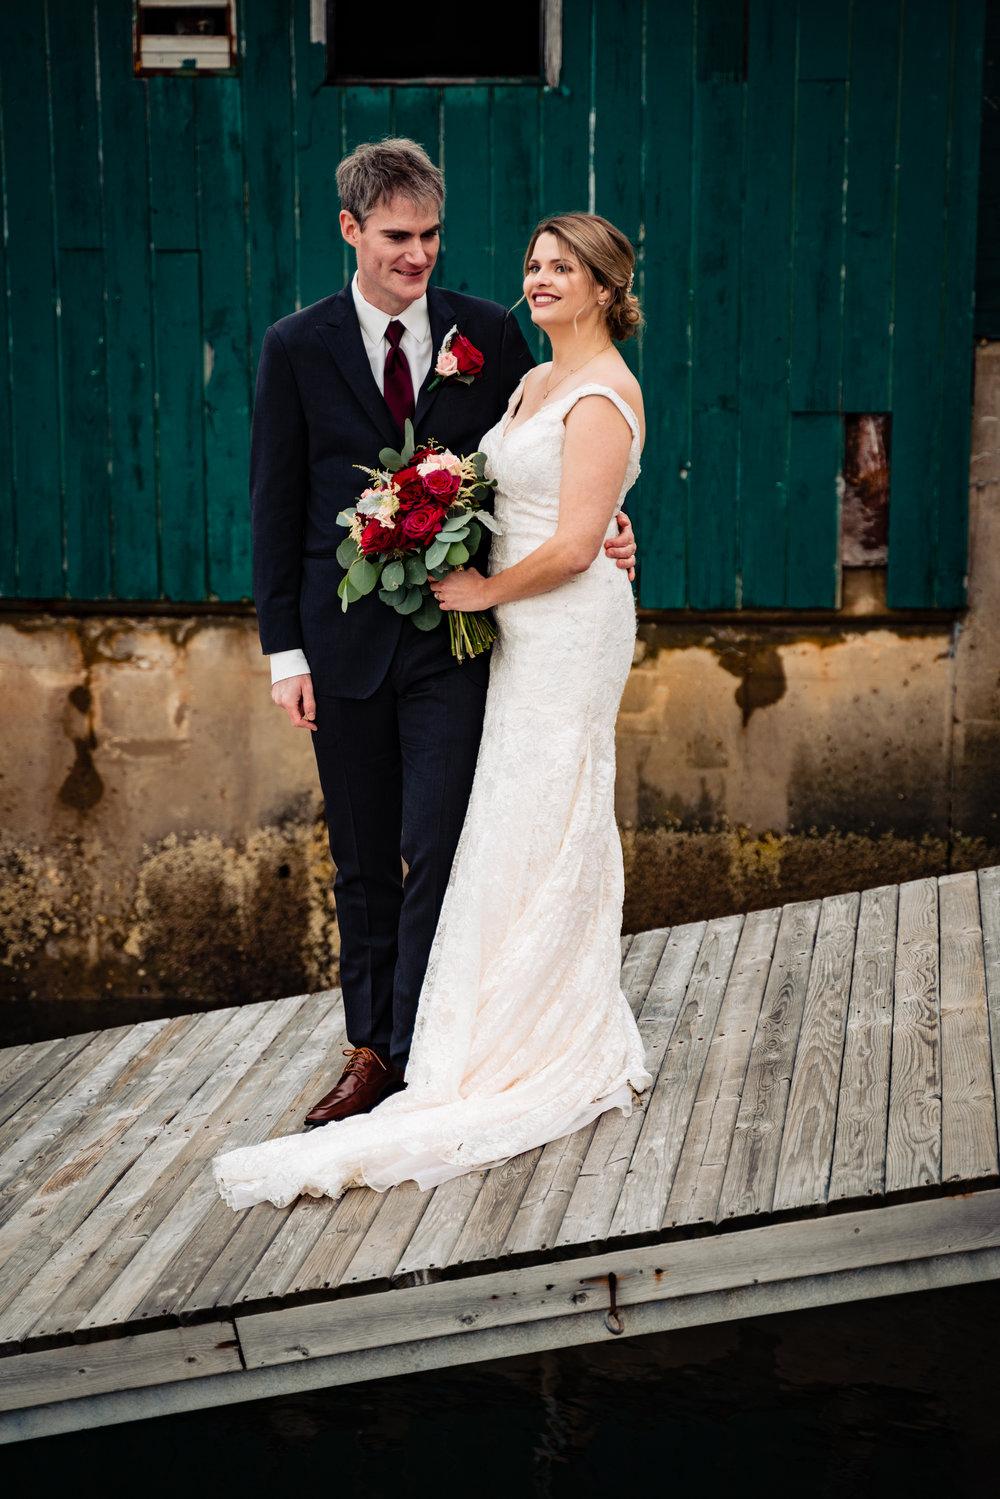 Waegwoltic-Halifax-Wedding-venue-novascotia-ottawa-ontario (100 of 141).jpg